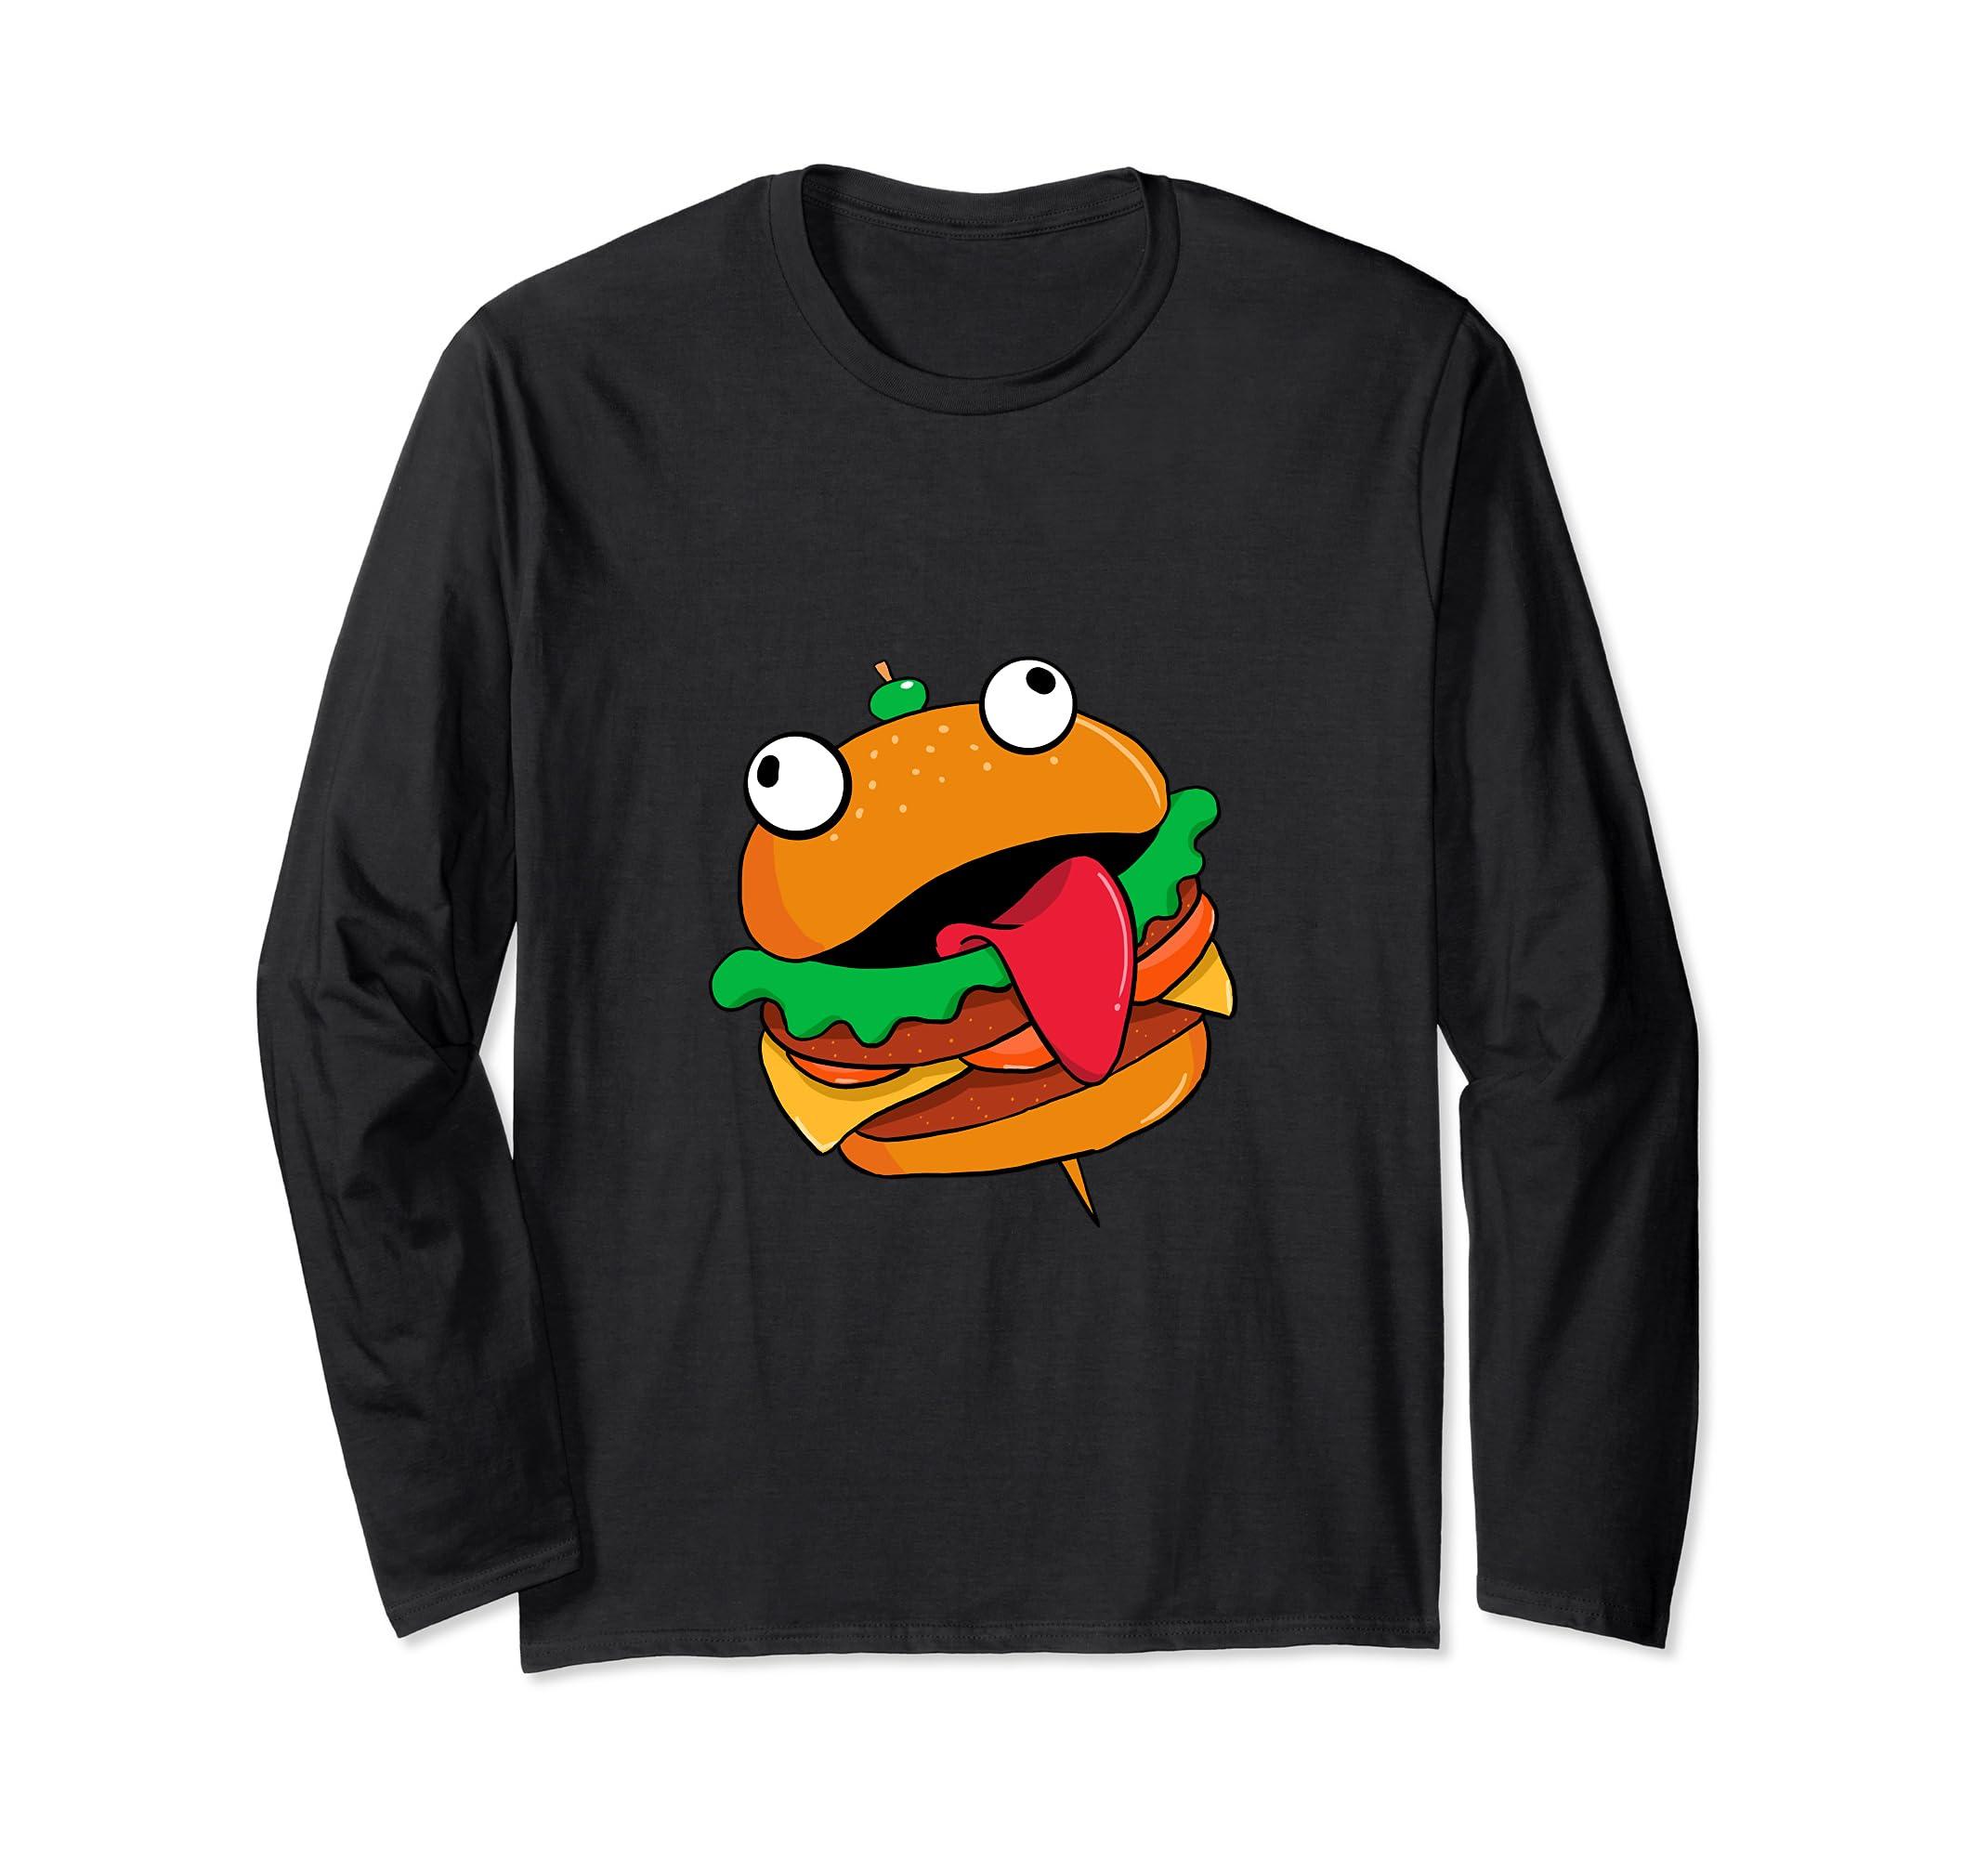 Amazon.com: Funny Durr Epic Long Sleeve T shirt: Clothing